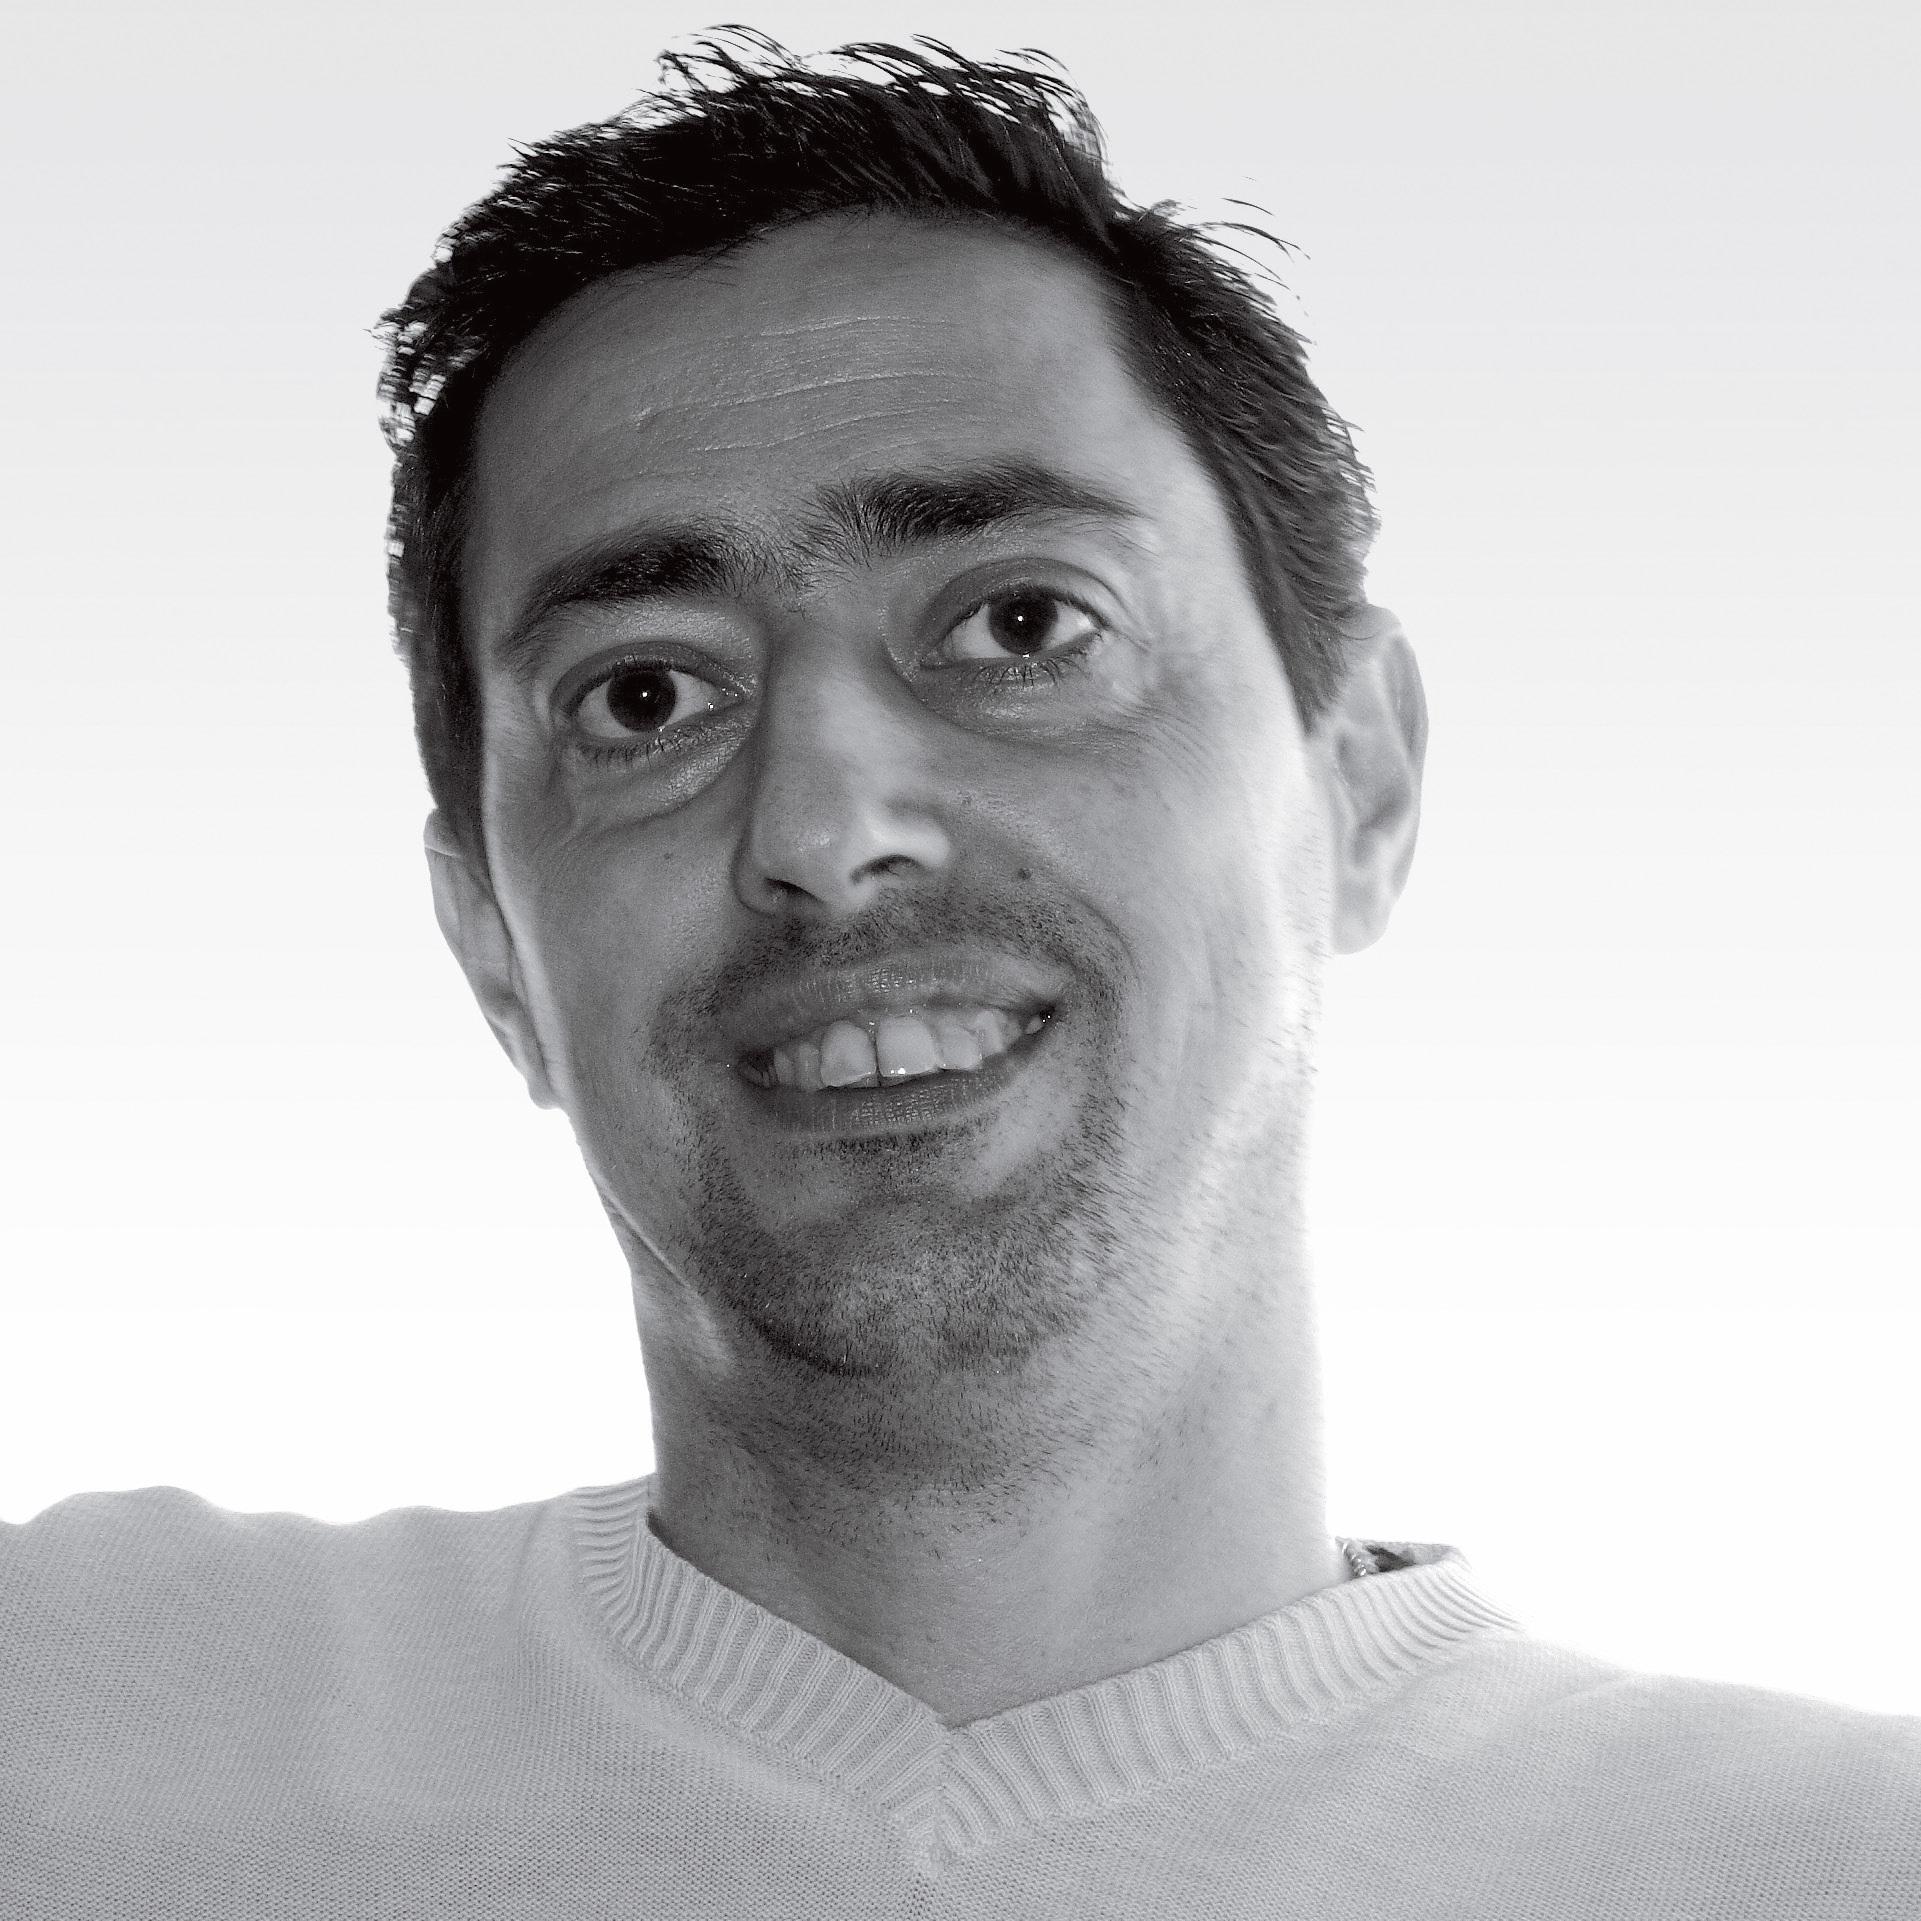 Daniele Fossali